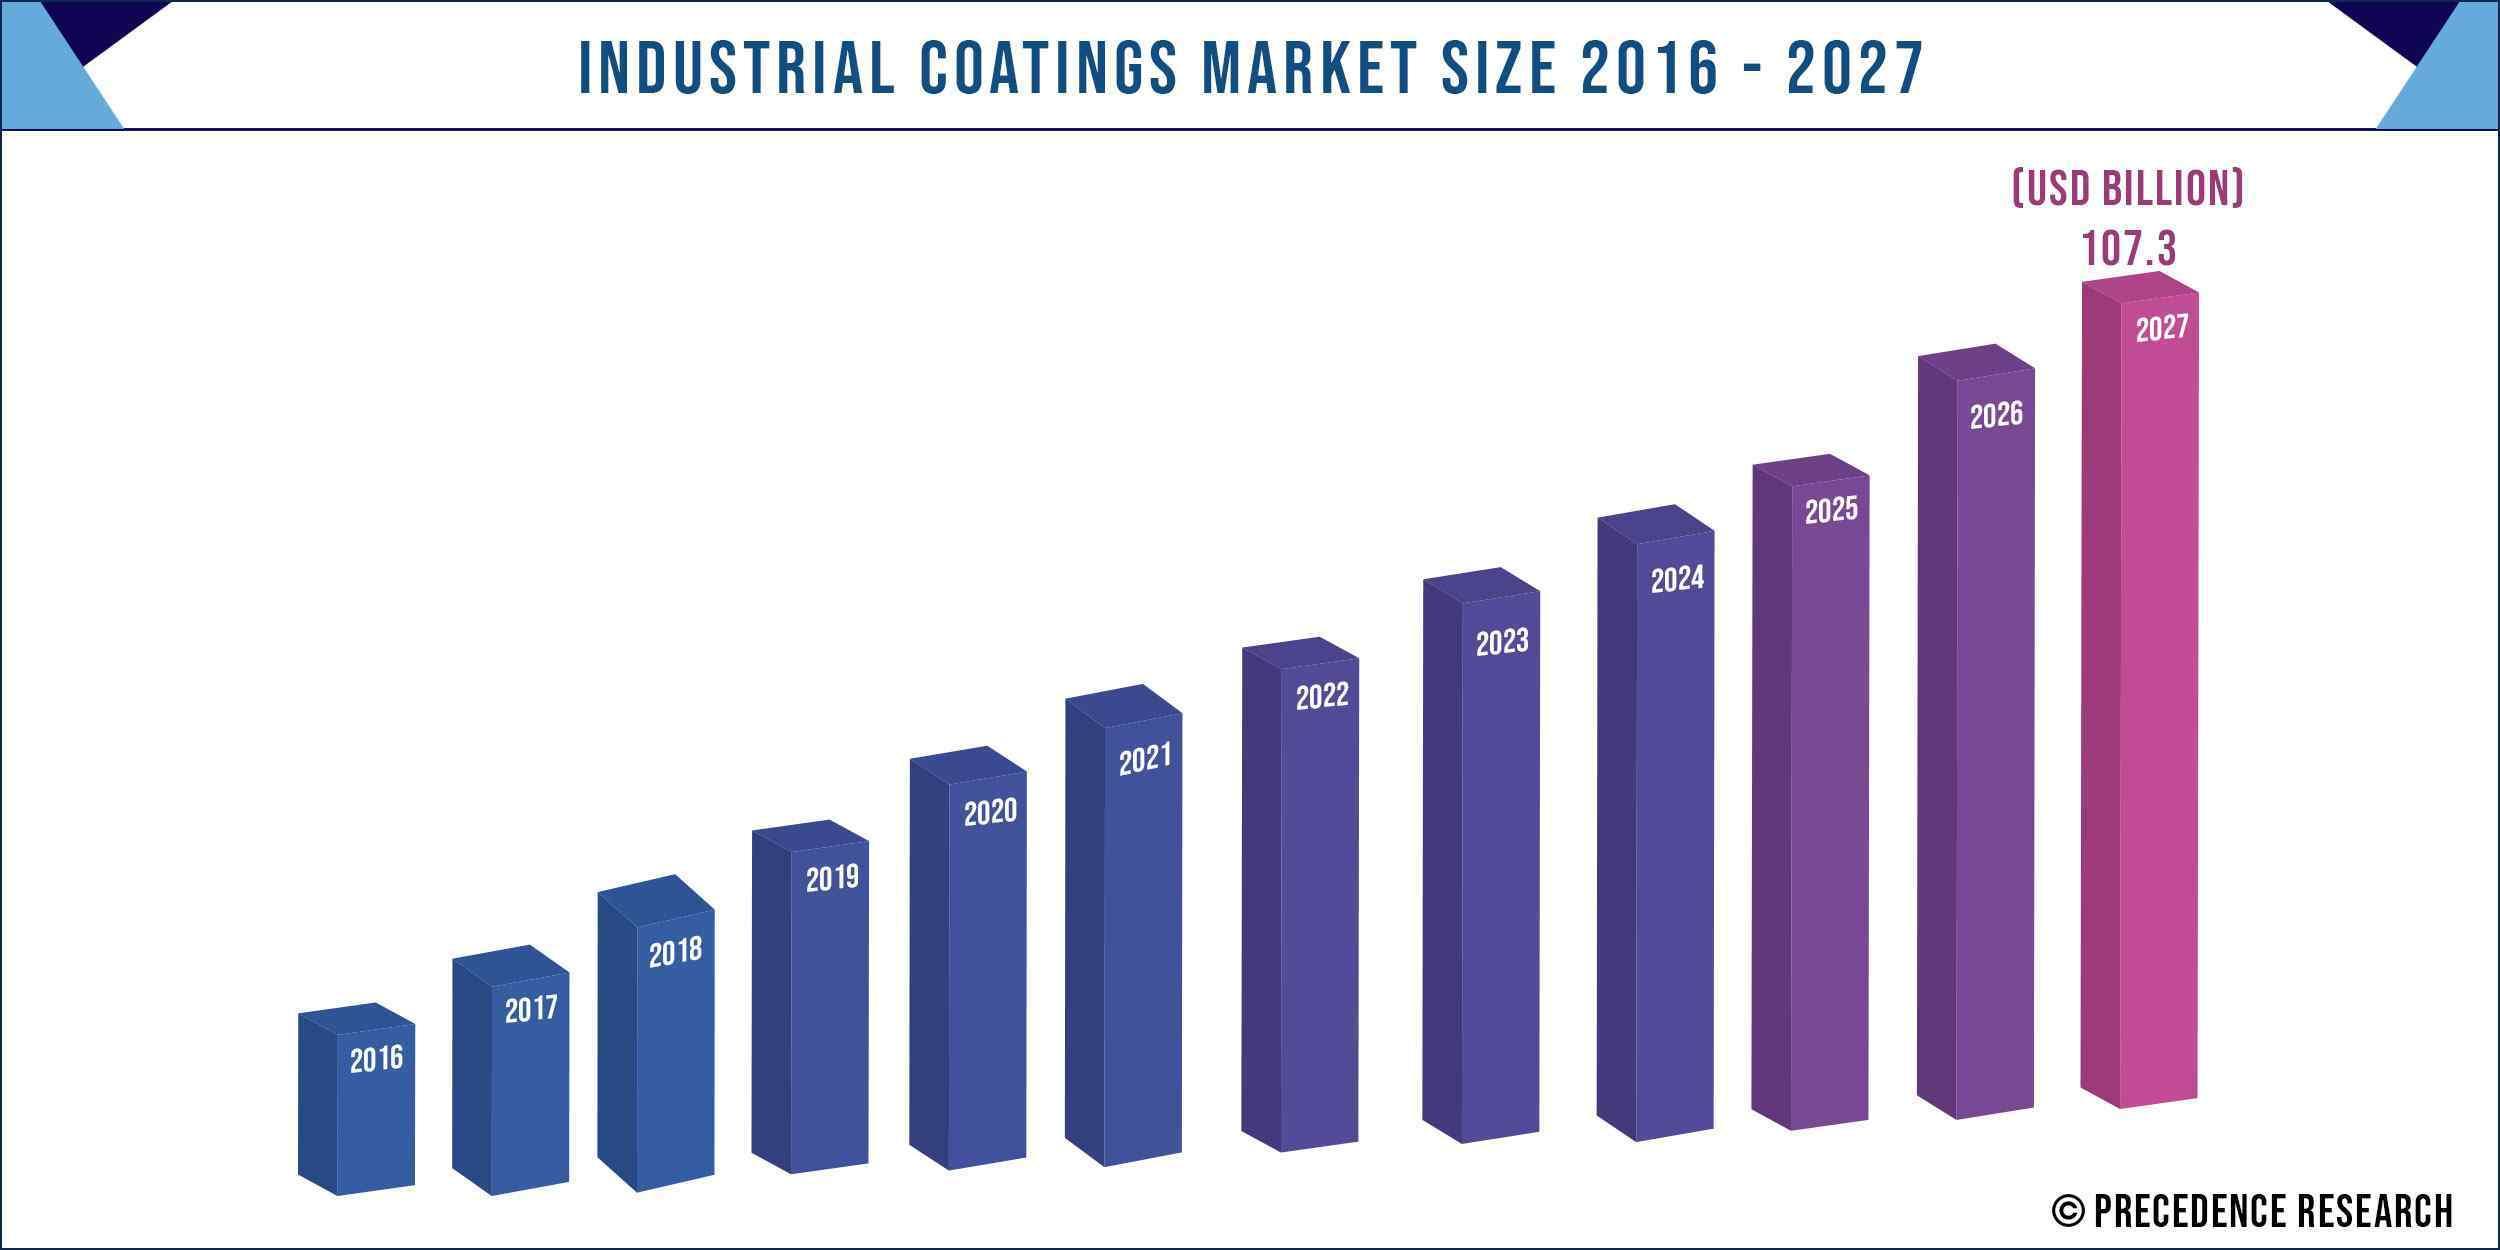 Industrial Coatings Market Size 2016-2027